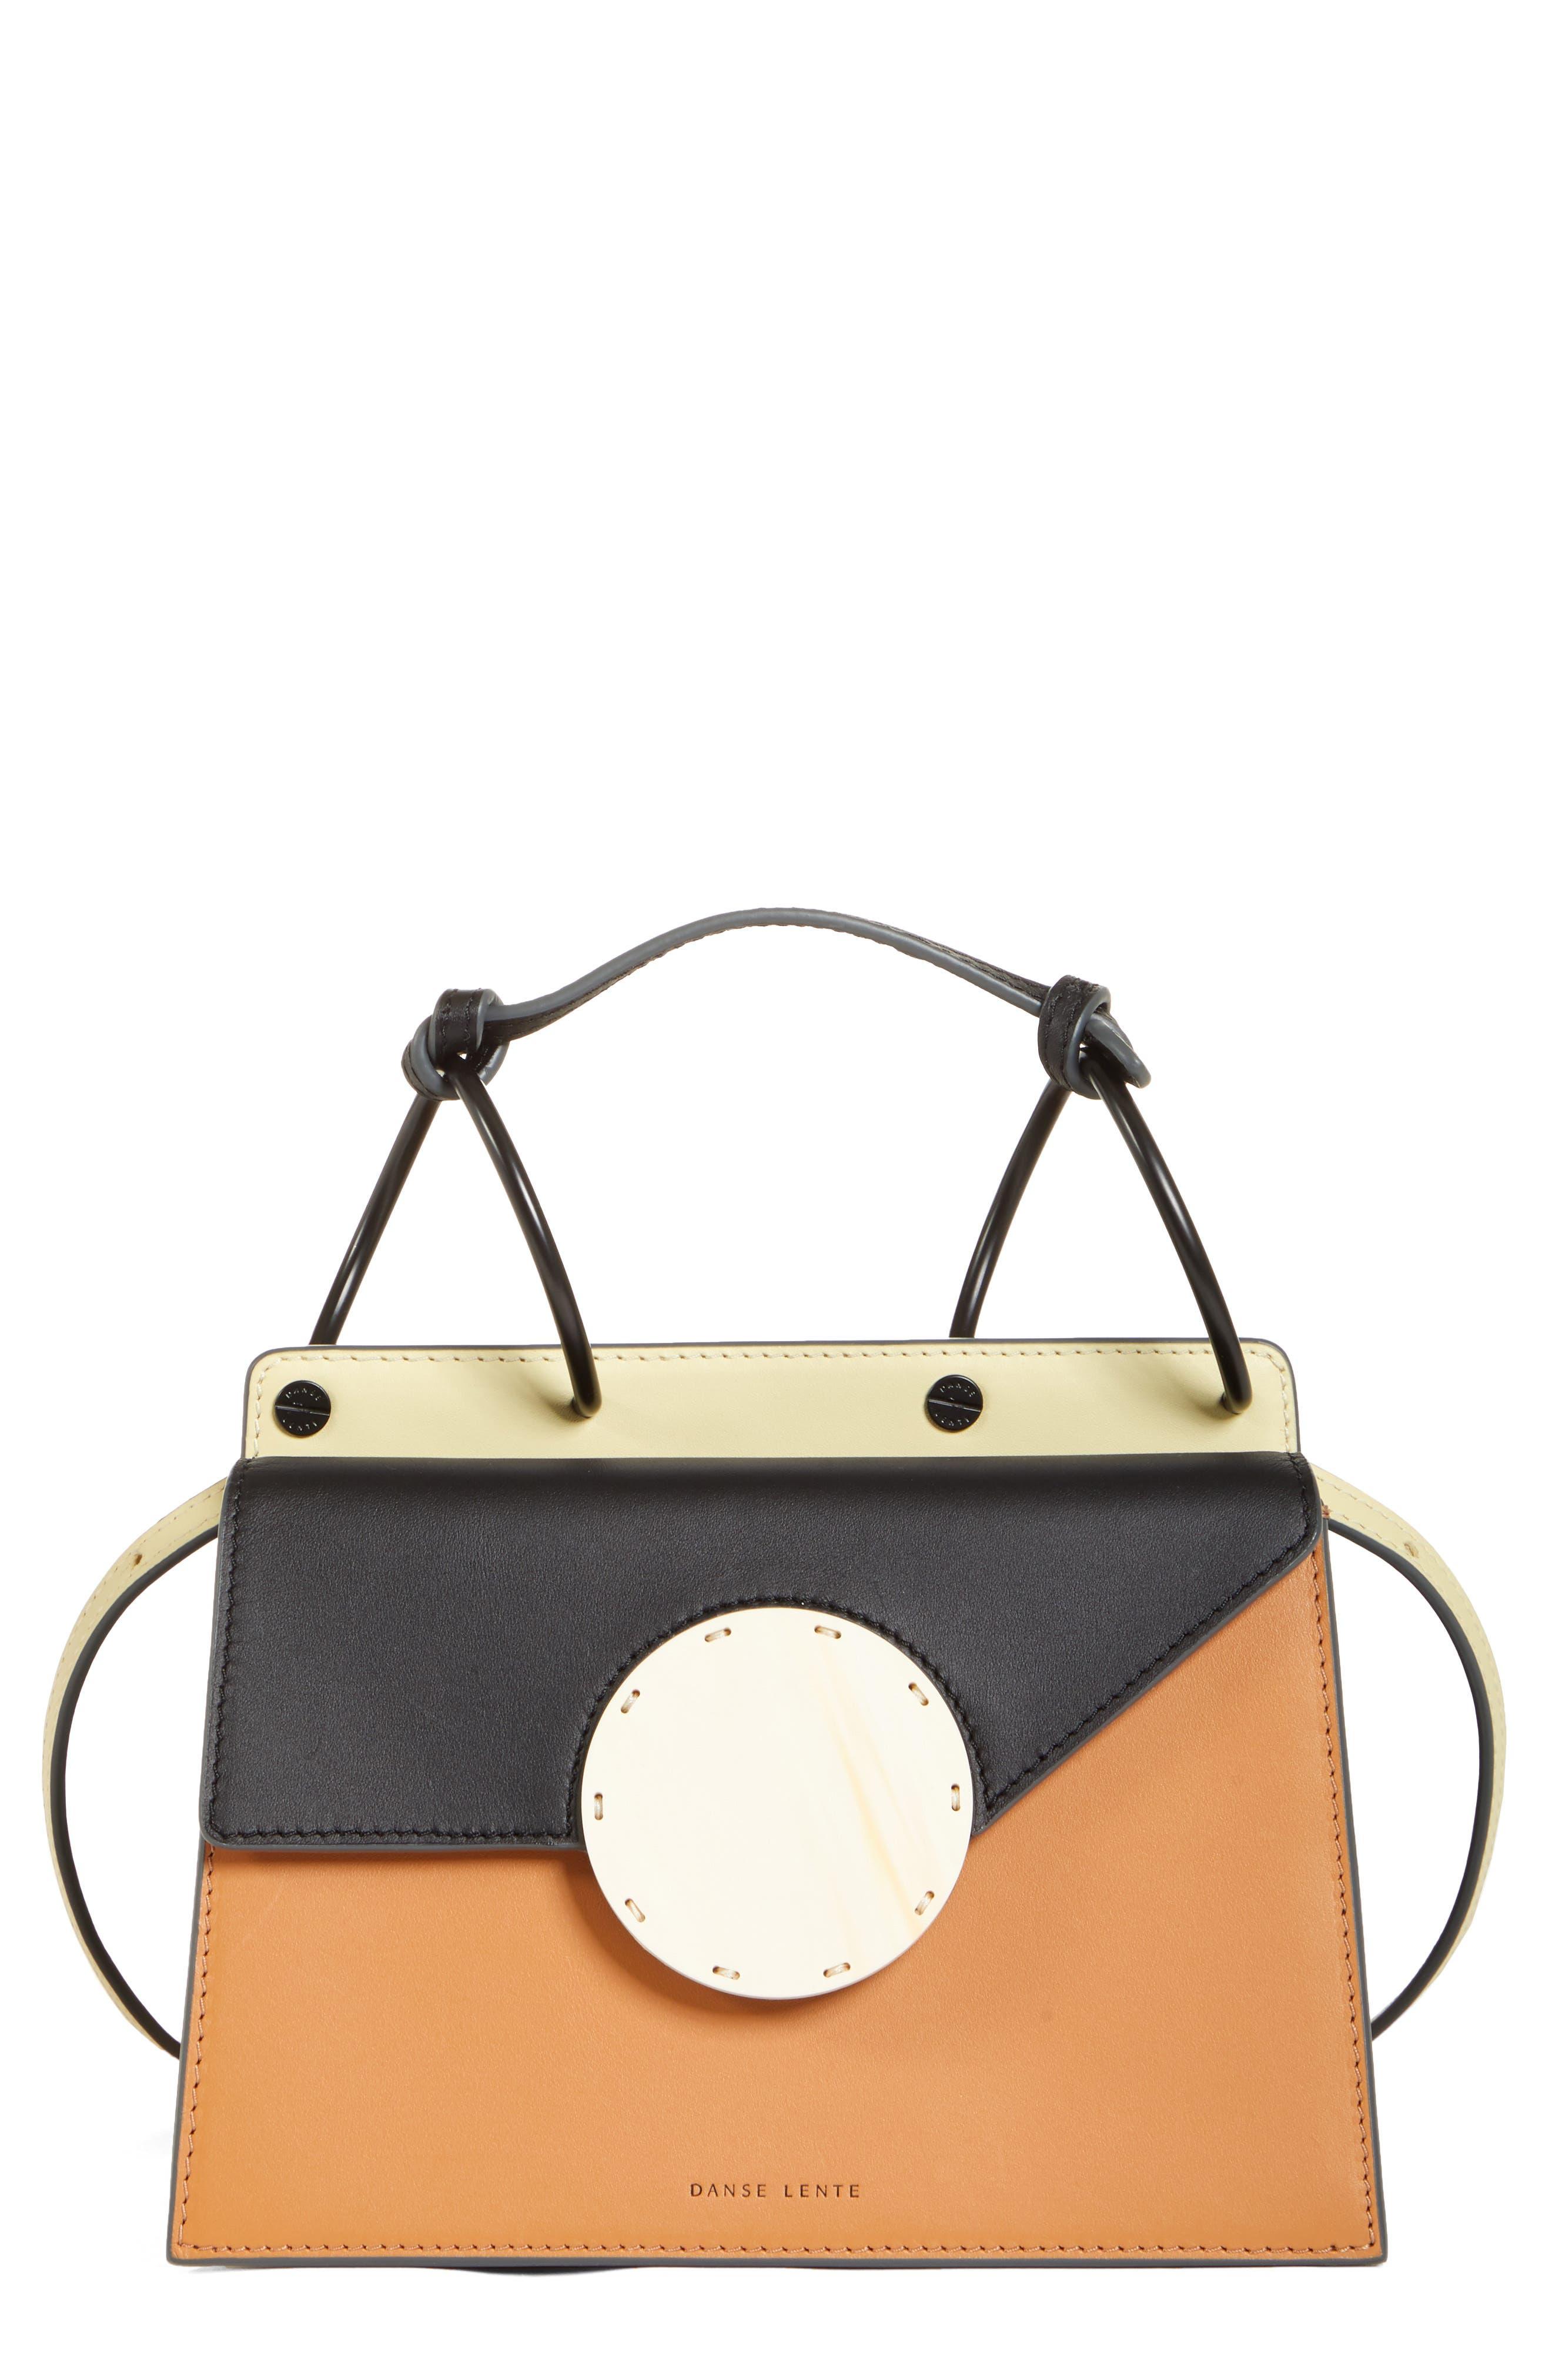 DANSE LENTE Phoebe Bis Acetate Closure Crossbody Bag, Main, color, TOFFEE/ BLACK